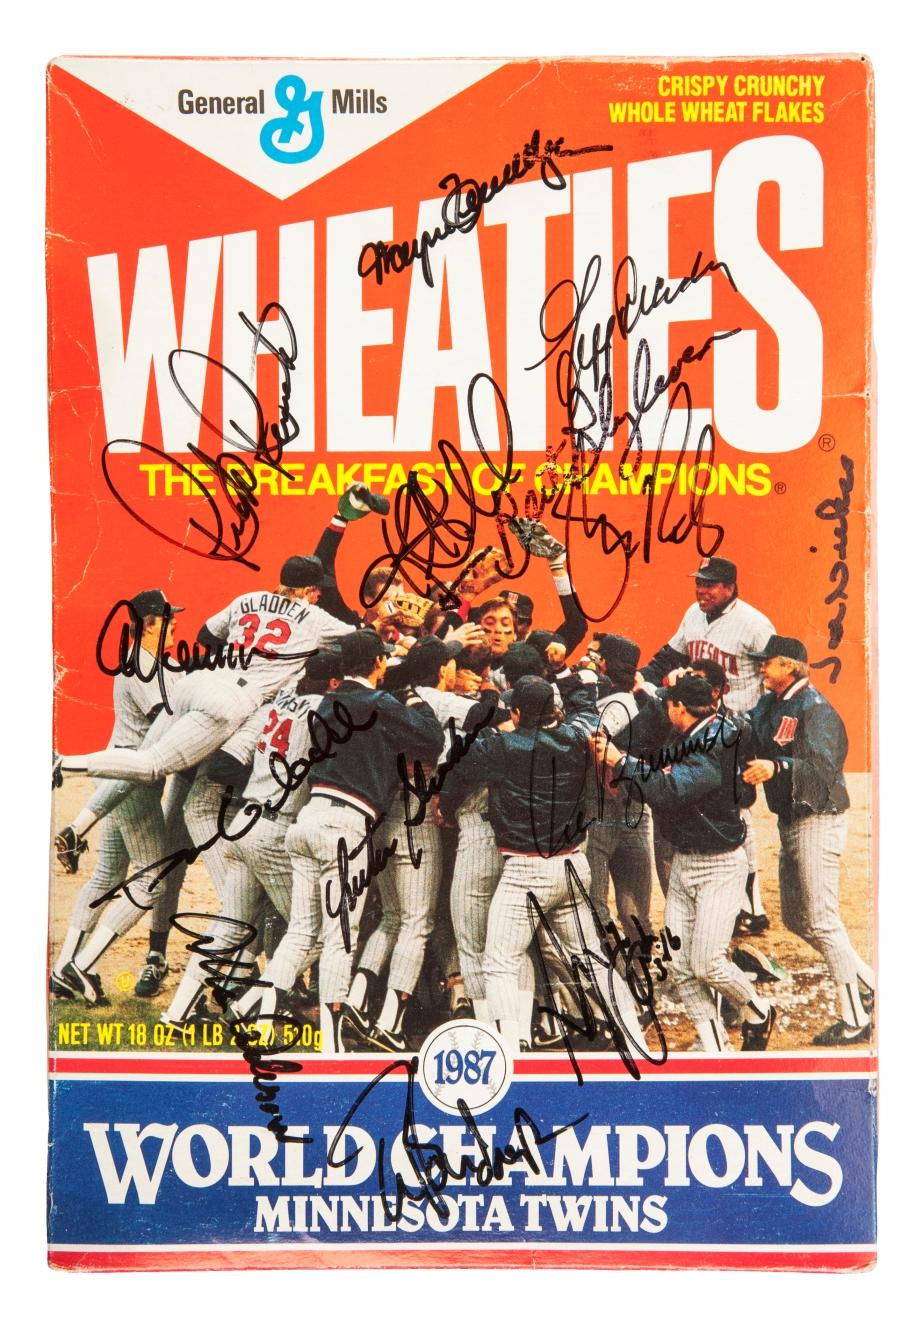 Minnesota Twins Win The 1987 World SeriesAgain